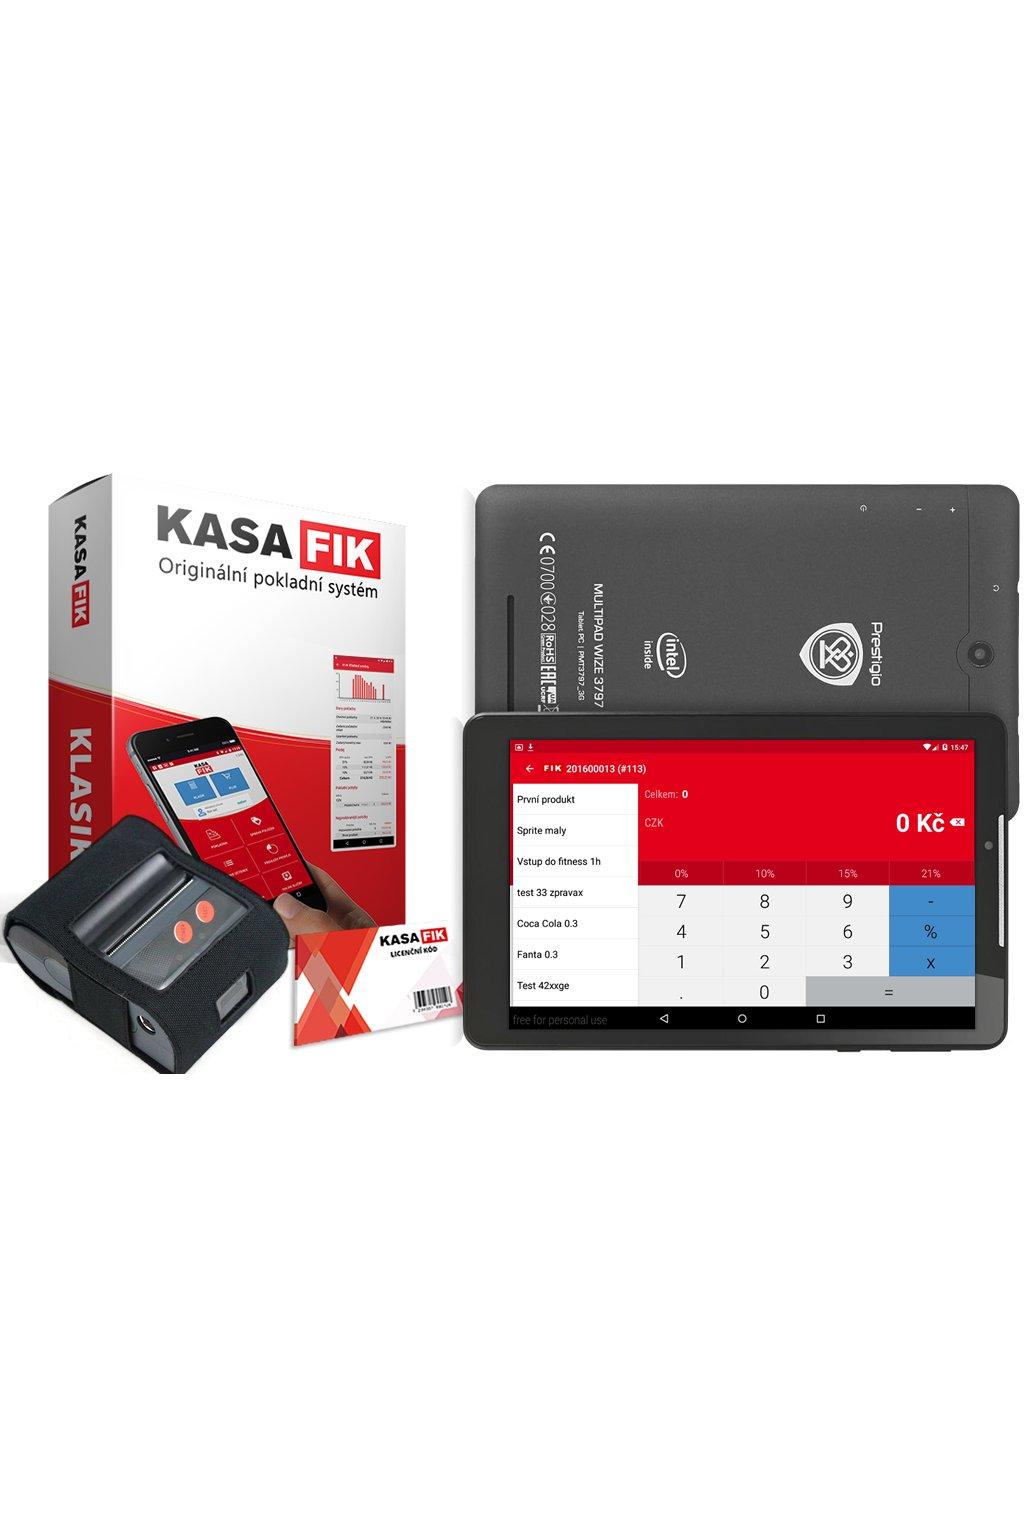 kasa fik klasik with printer box